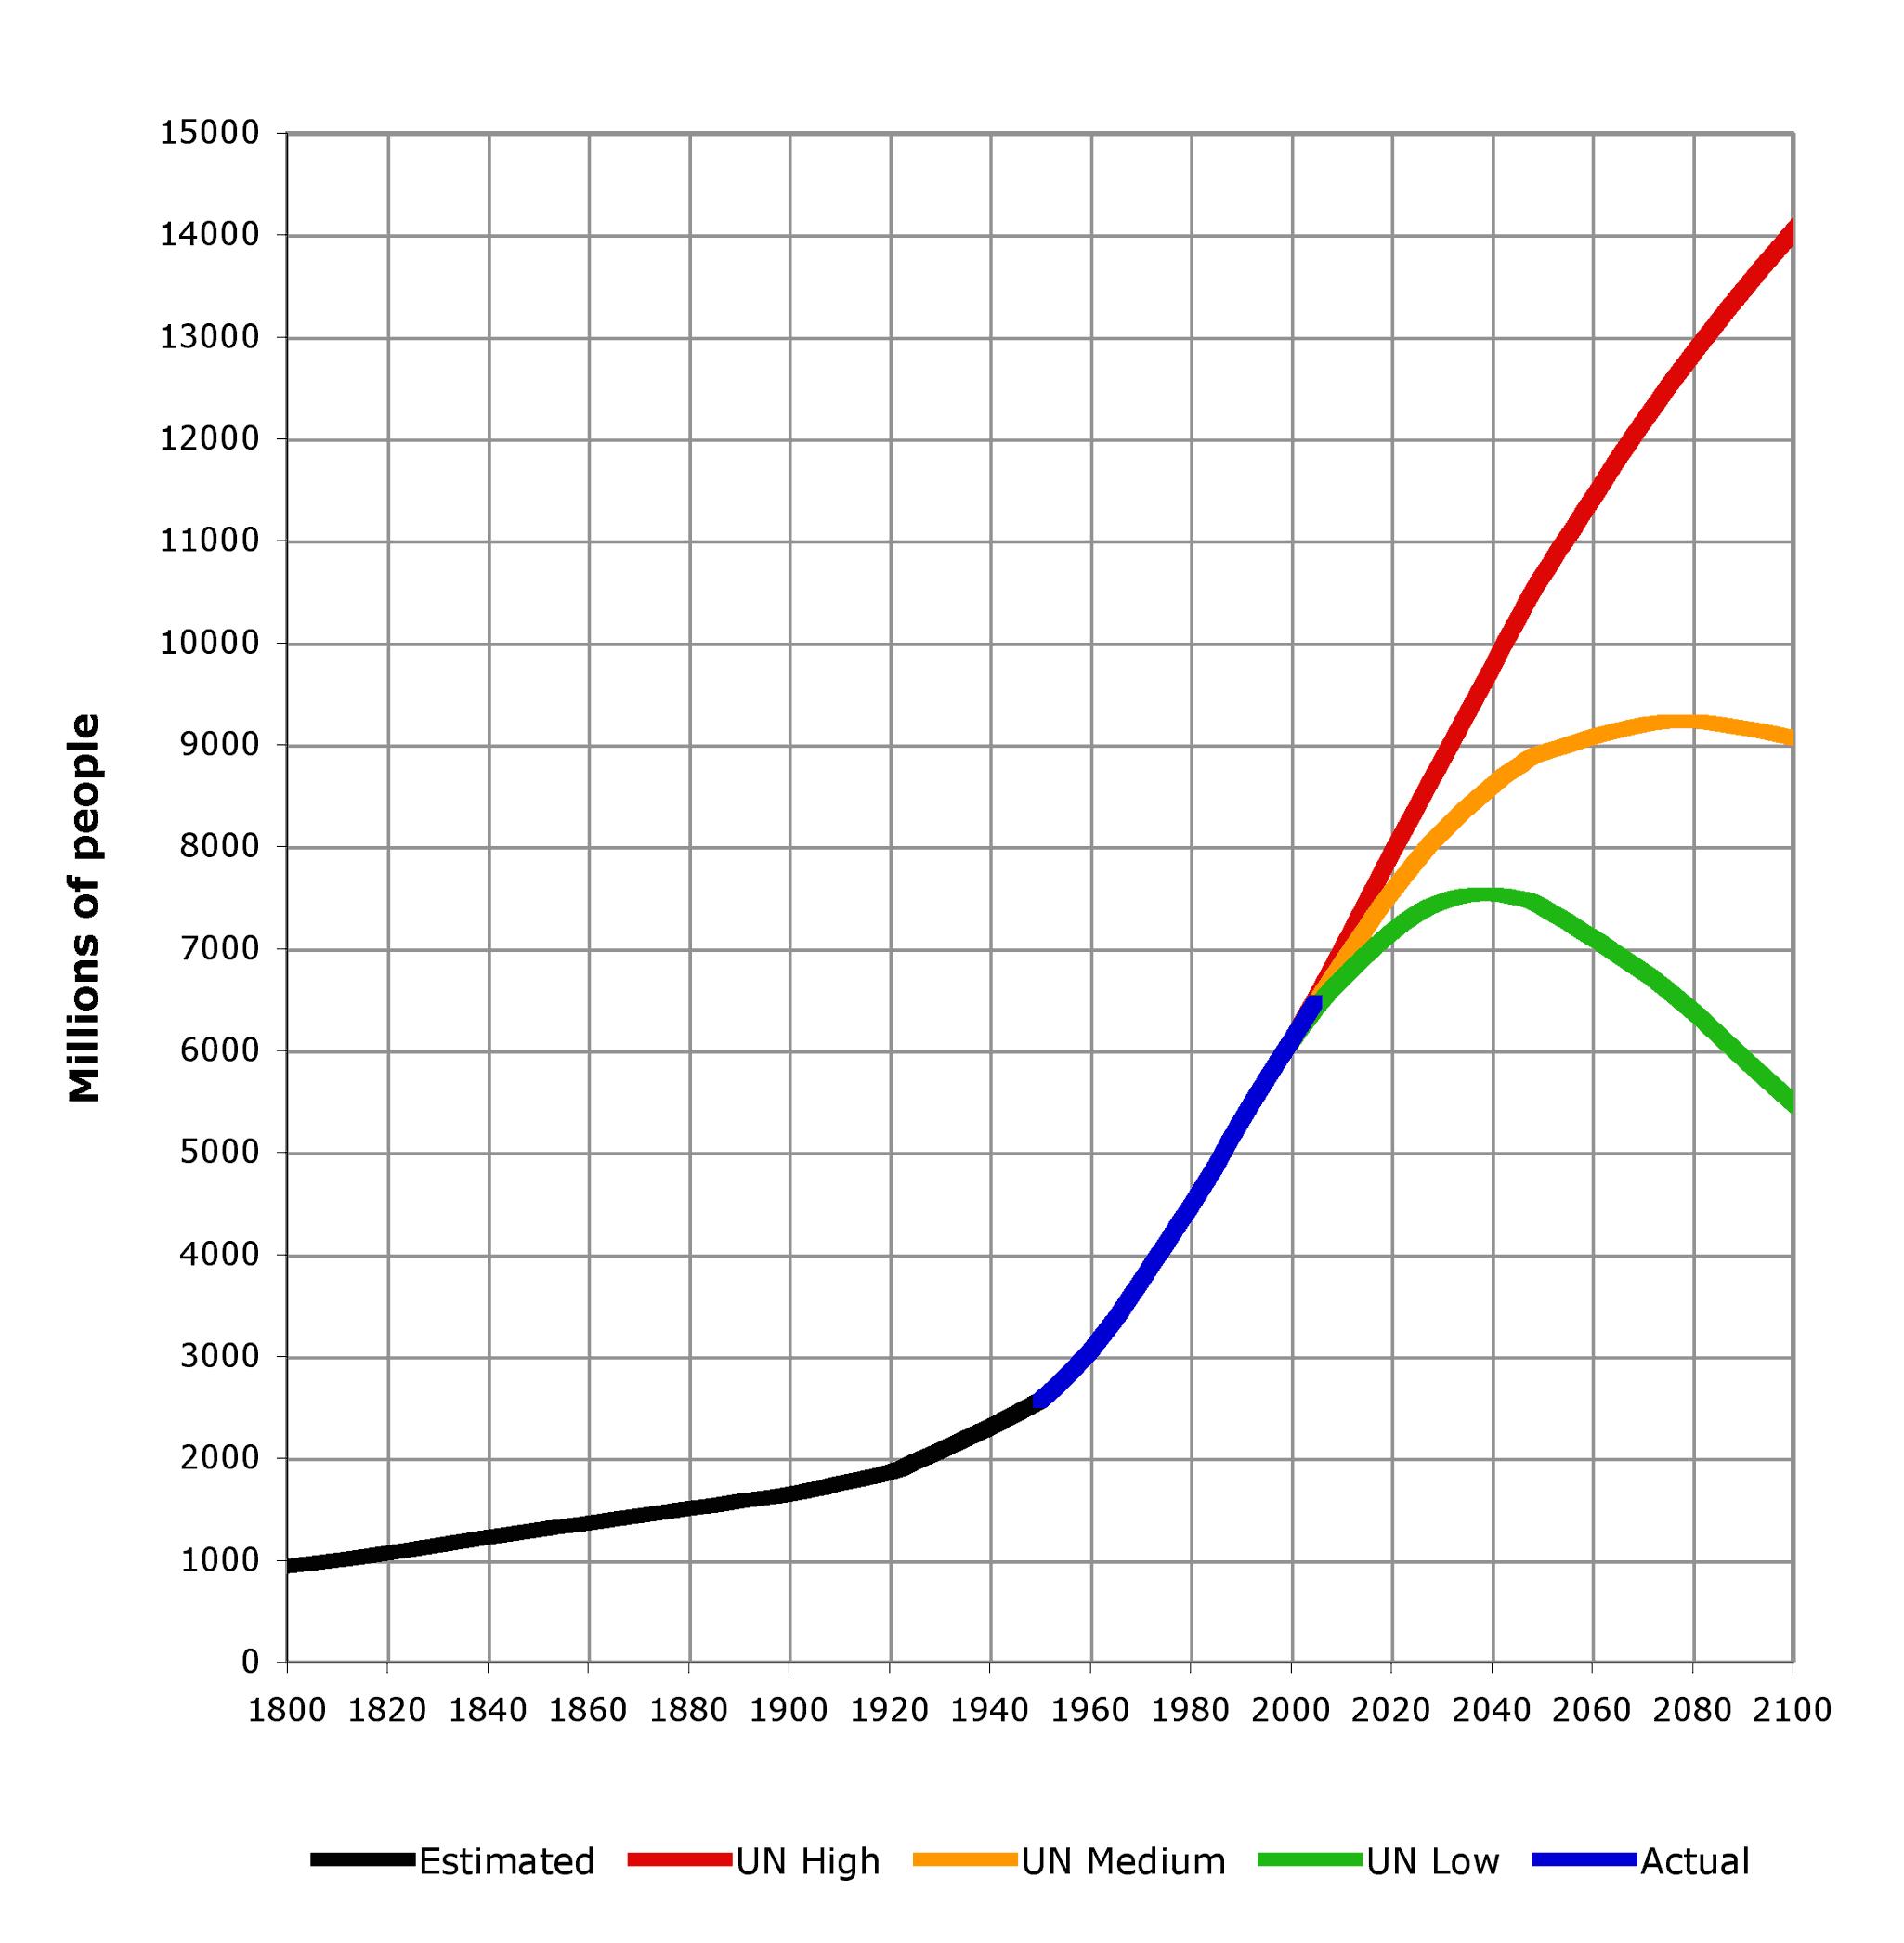 File:World-Population-1800-2100.png - Wikimedia Commons